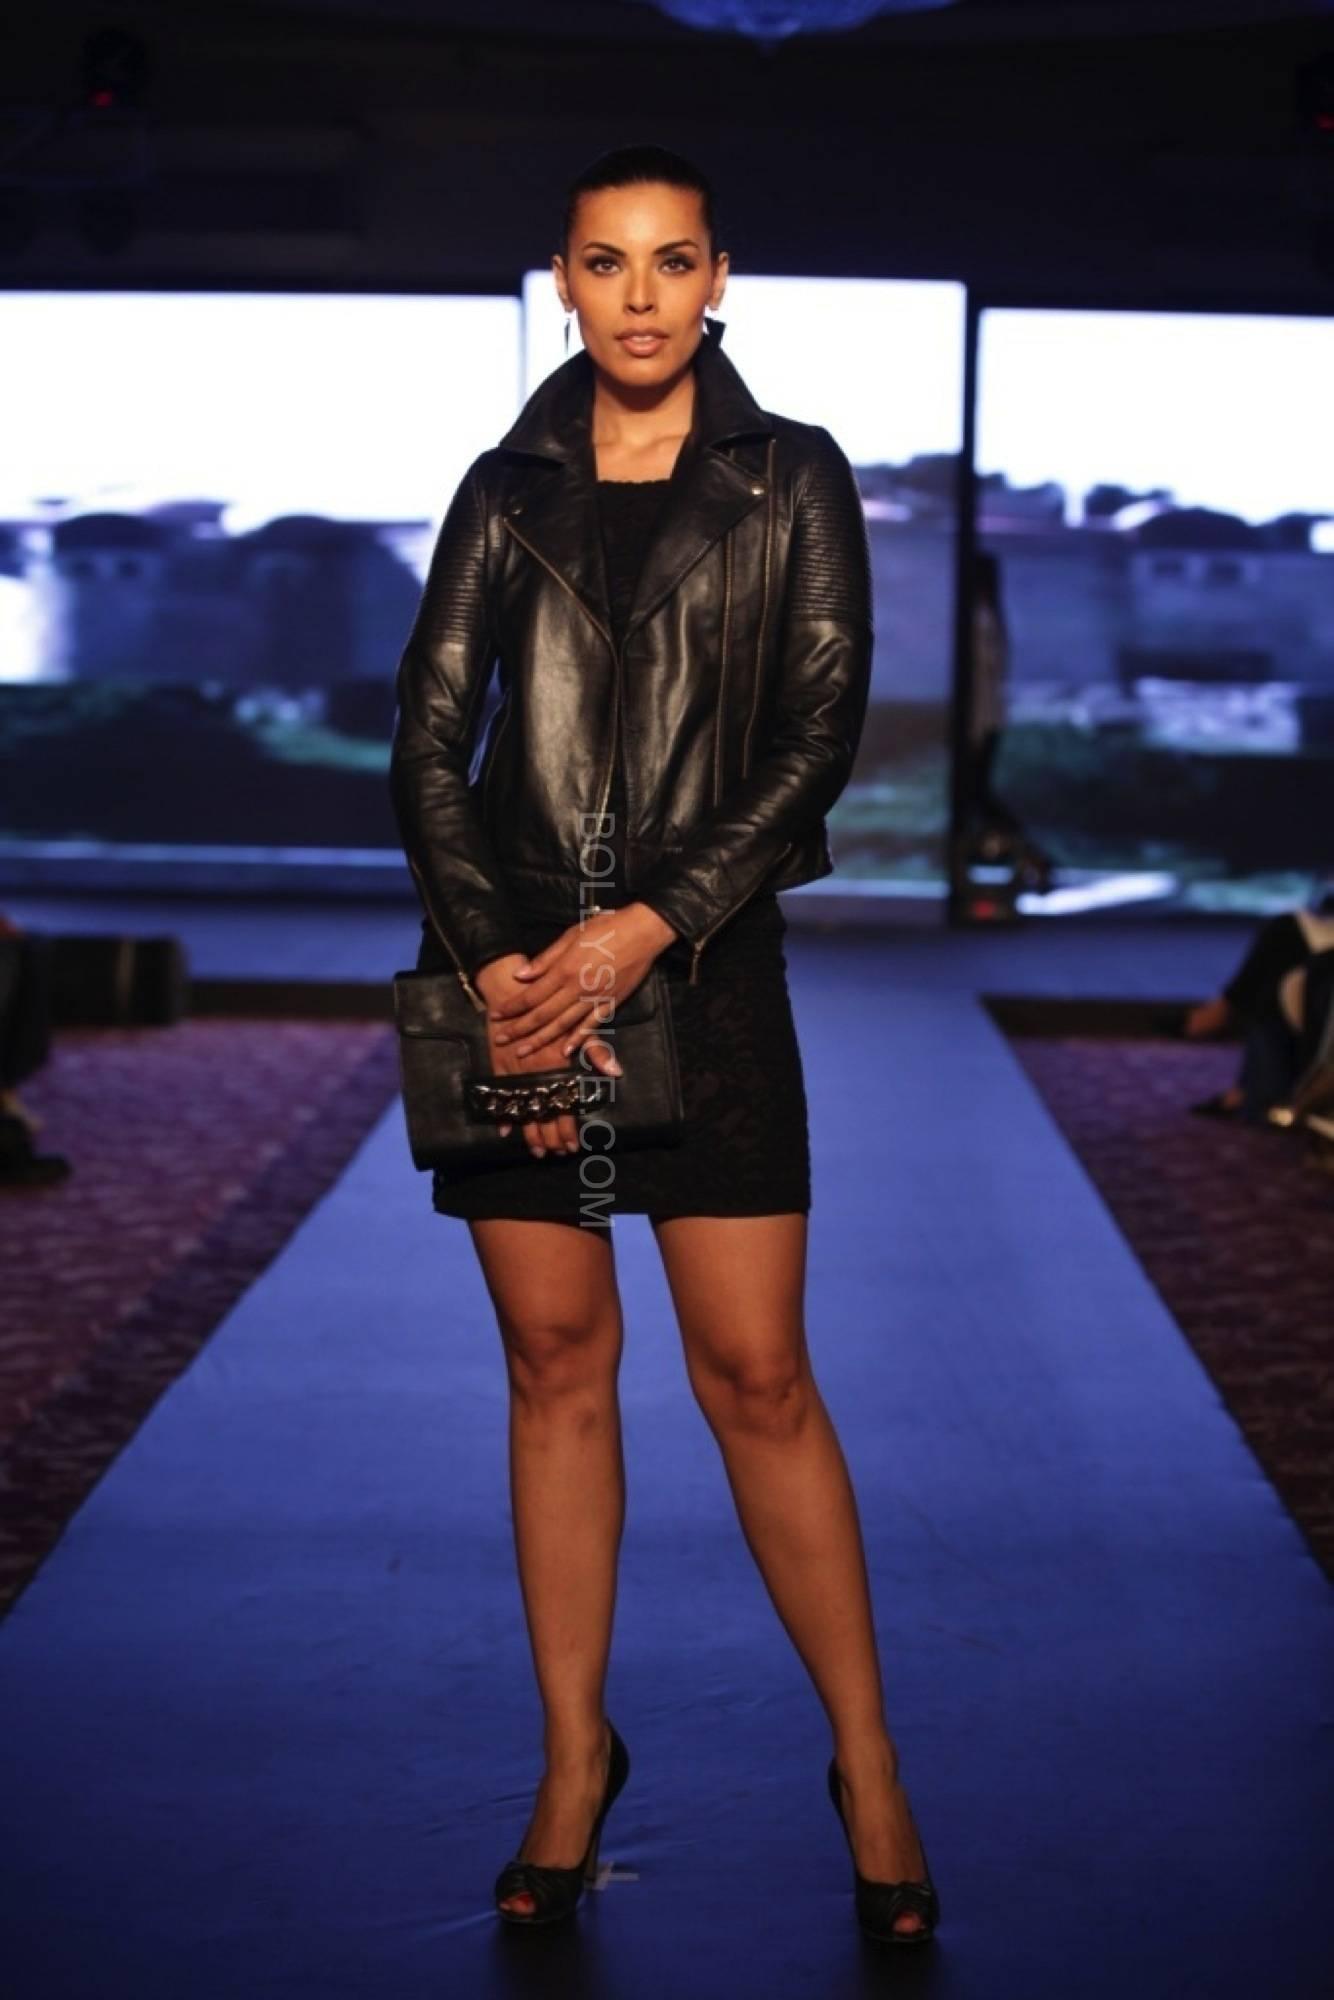 deepikapadukonefanfadhionshow7 Deepika Padukones Fans Fashion Show for Van Heusen